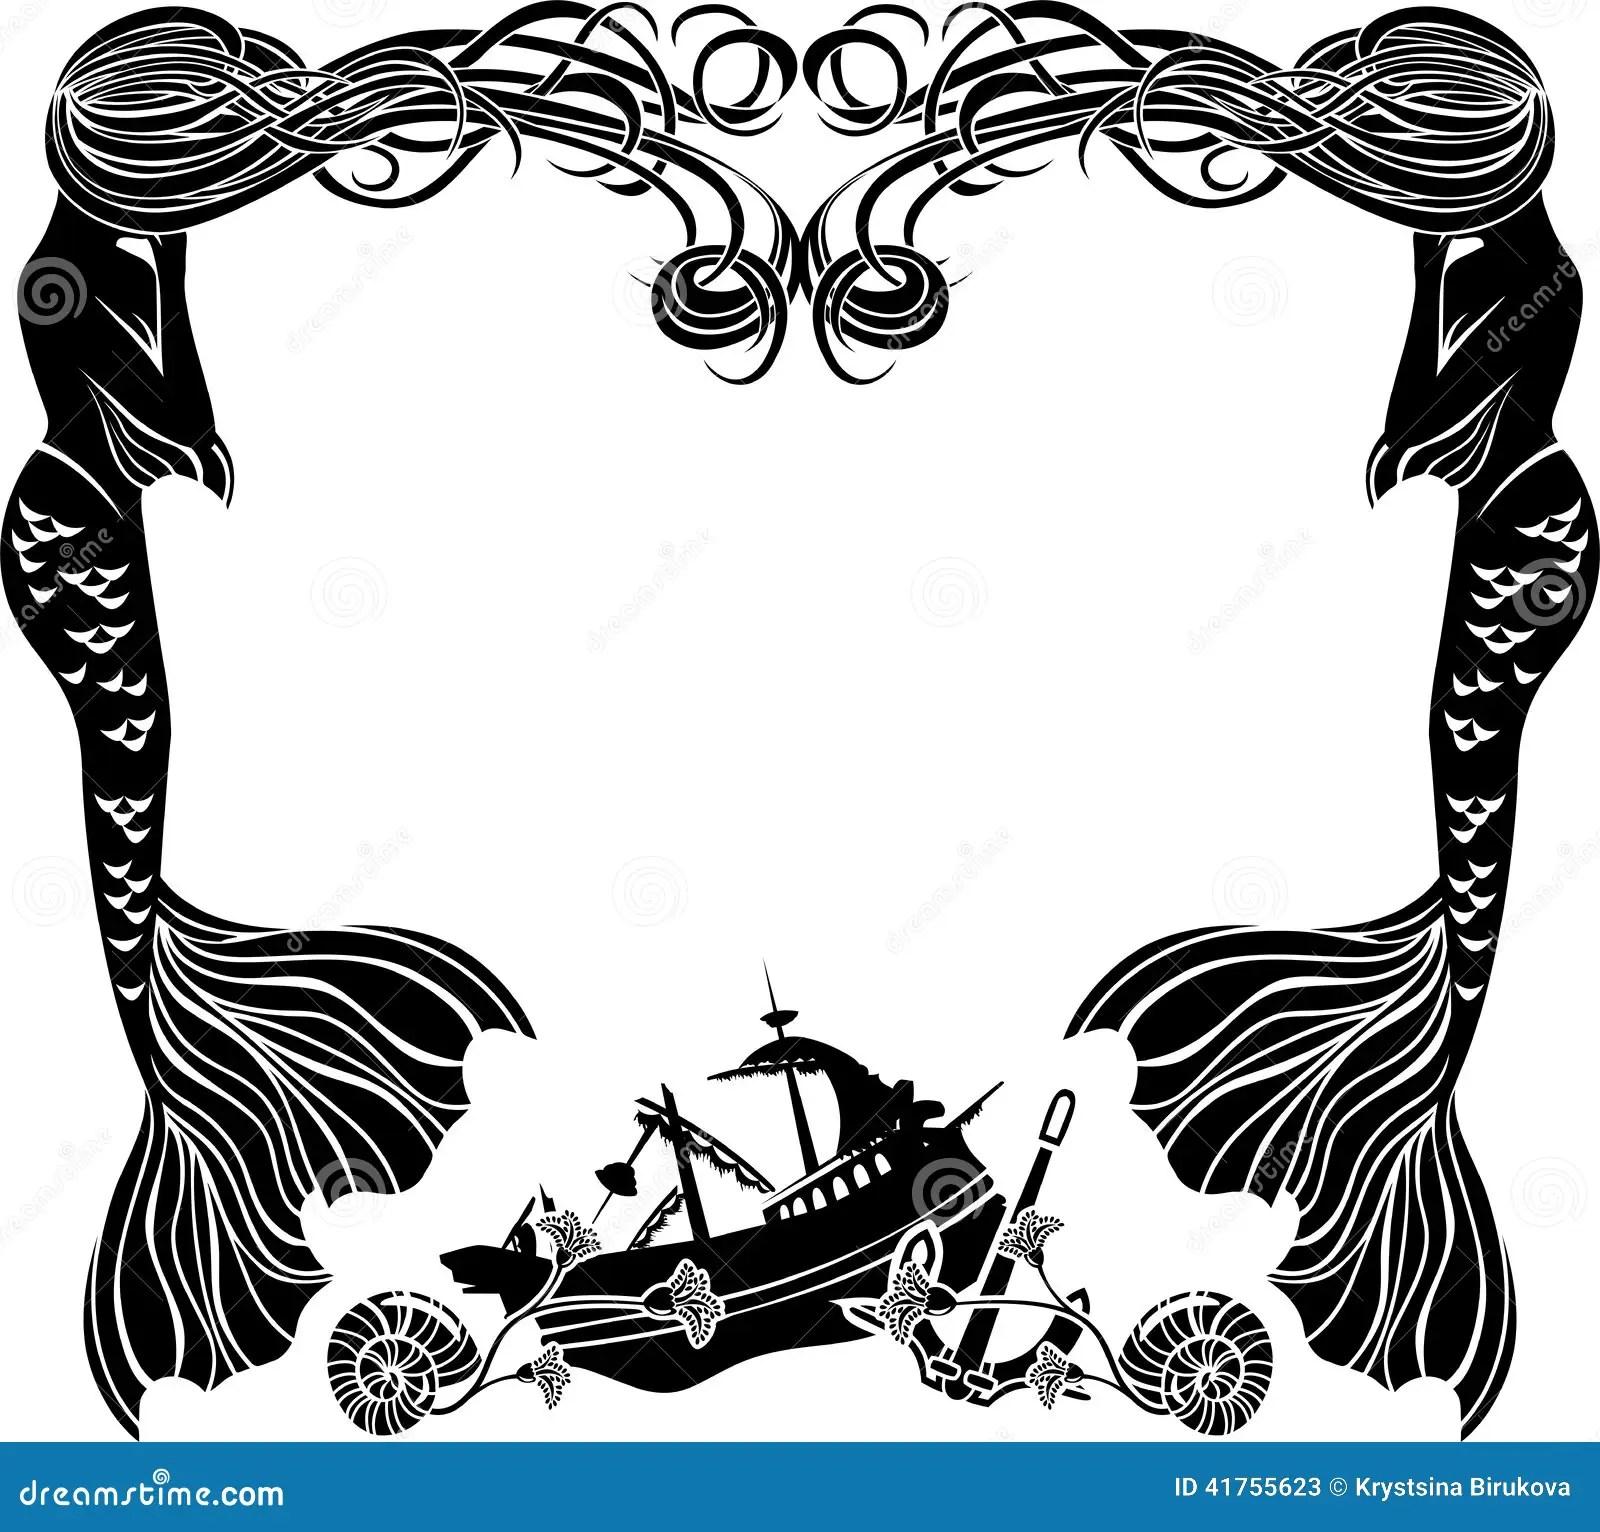 Frame Mermaids Weep Shipwreck Stock Vector